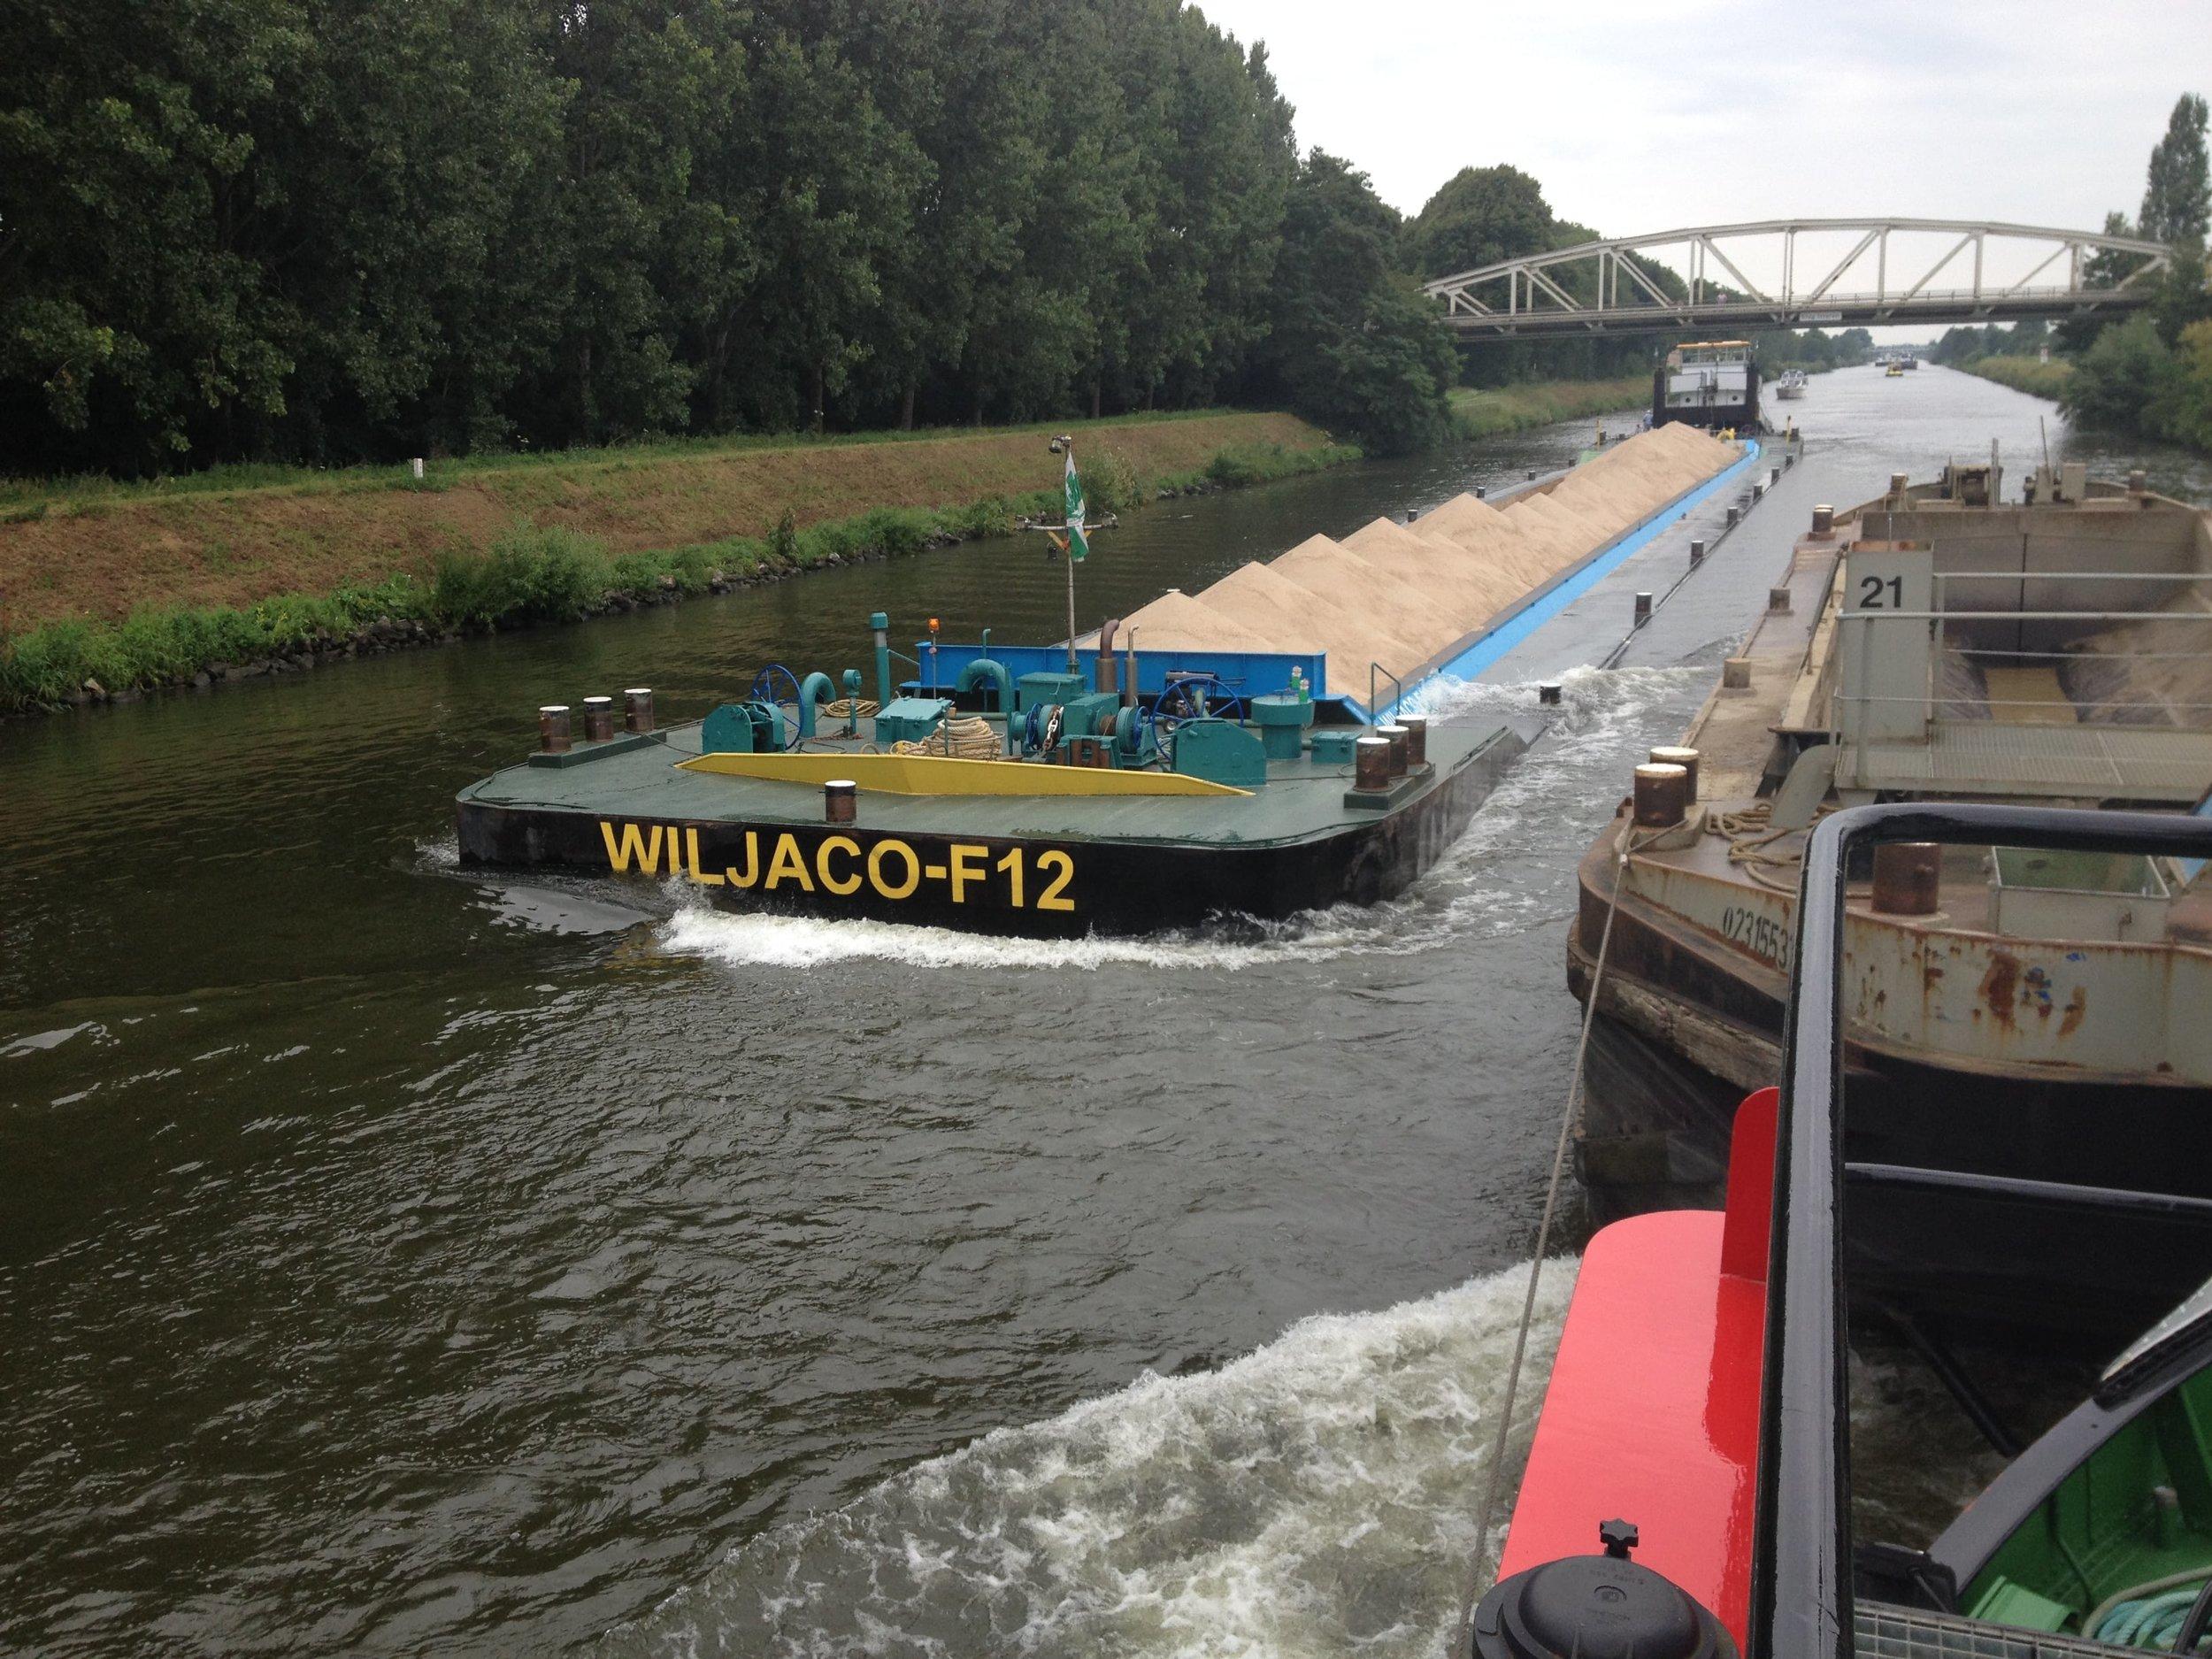 Wiljaco-F12.JPG